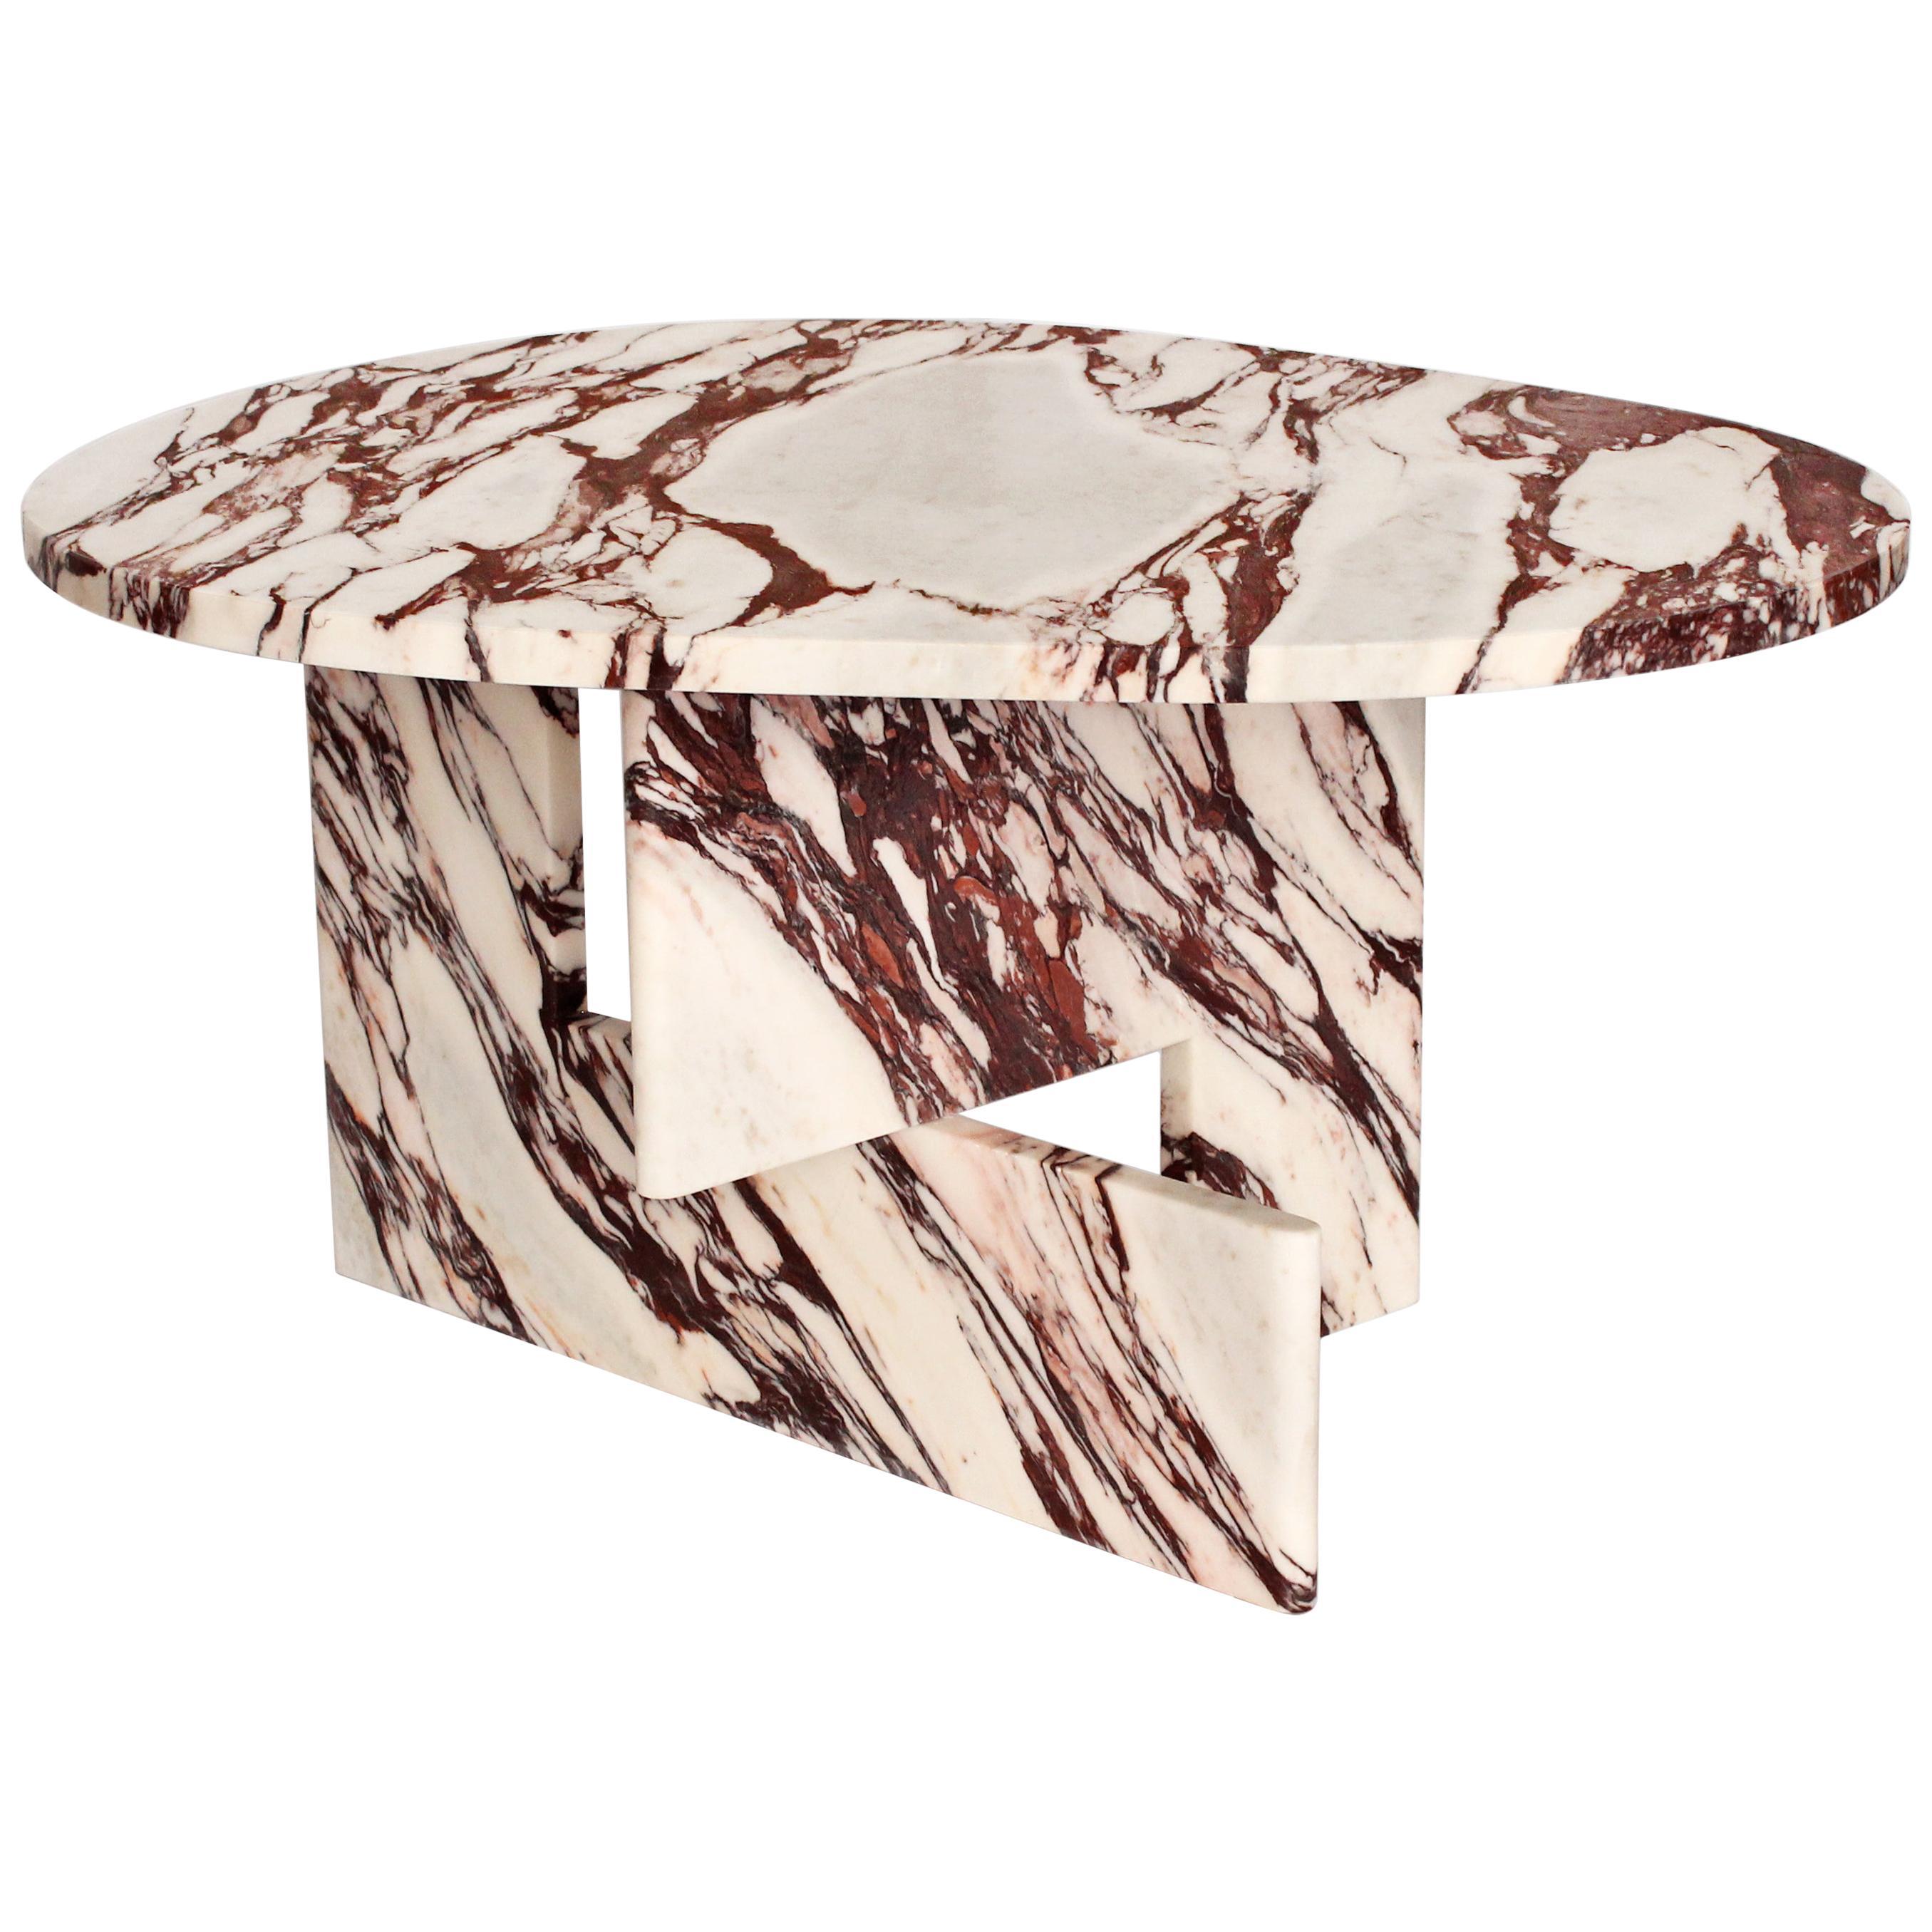 Sculptural Side Table in Marble, Sébastien Caporusso